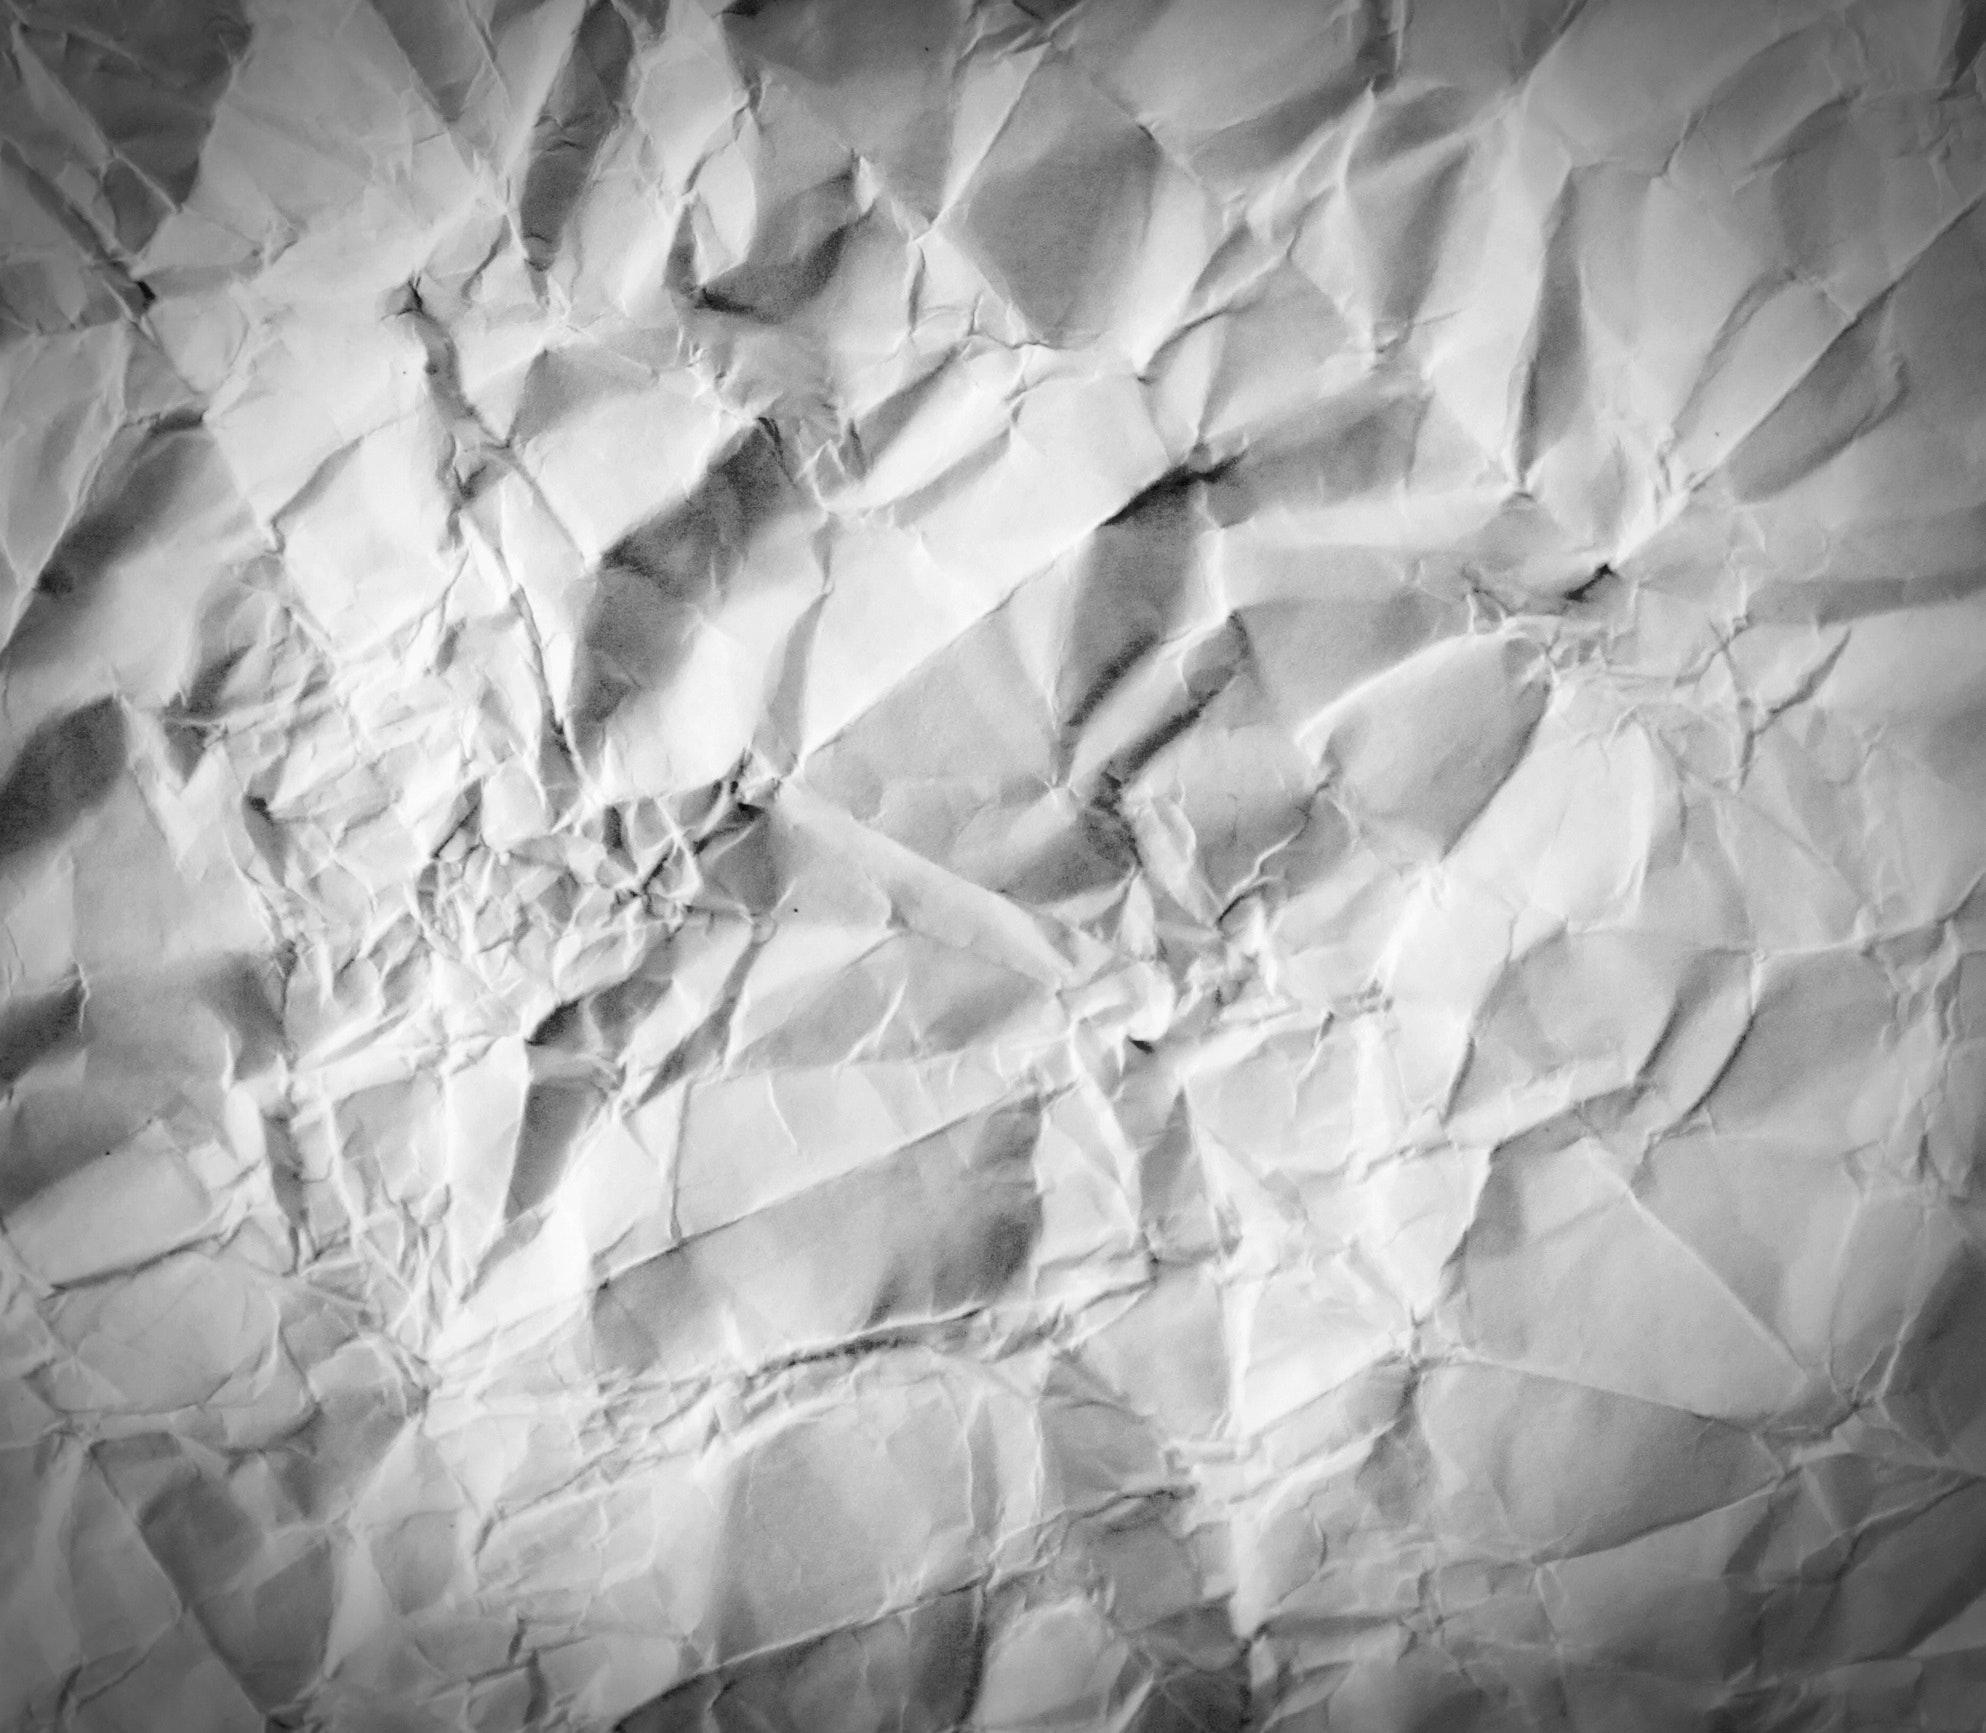 White crumpled paper photo